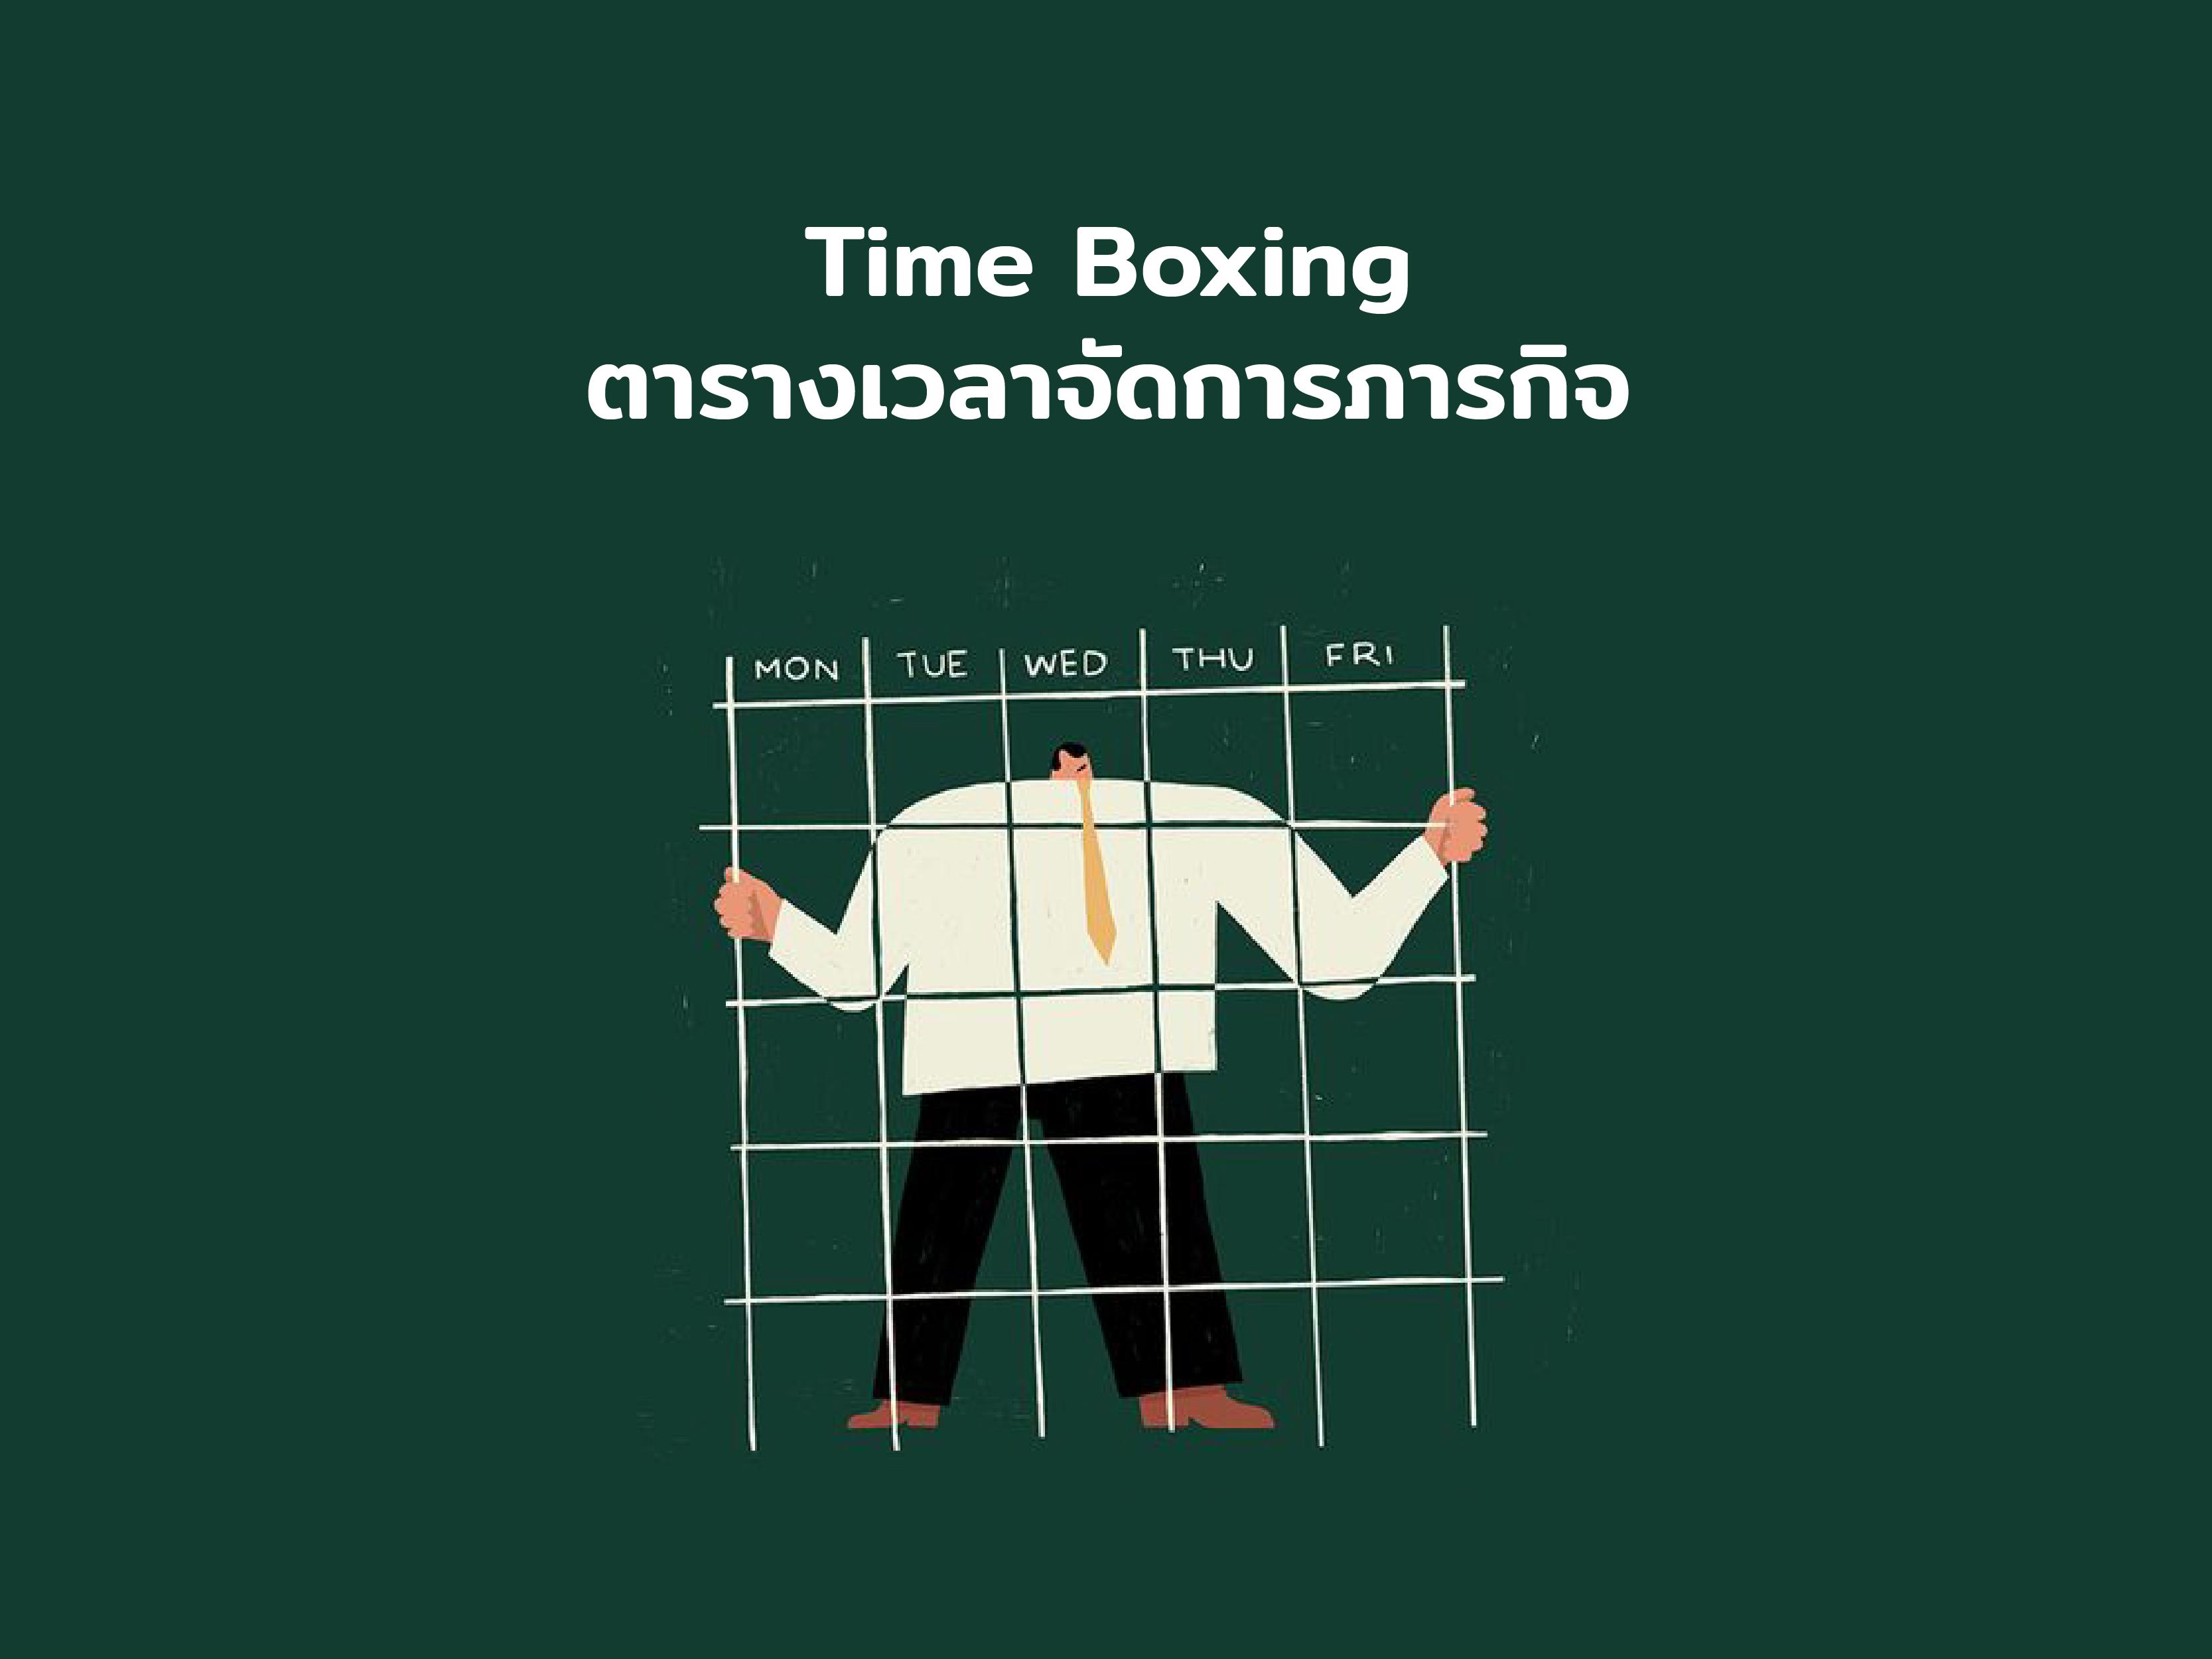 Time Boxing ตารางเวลาจัดการภารกิจ